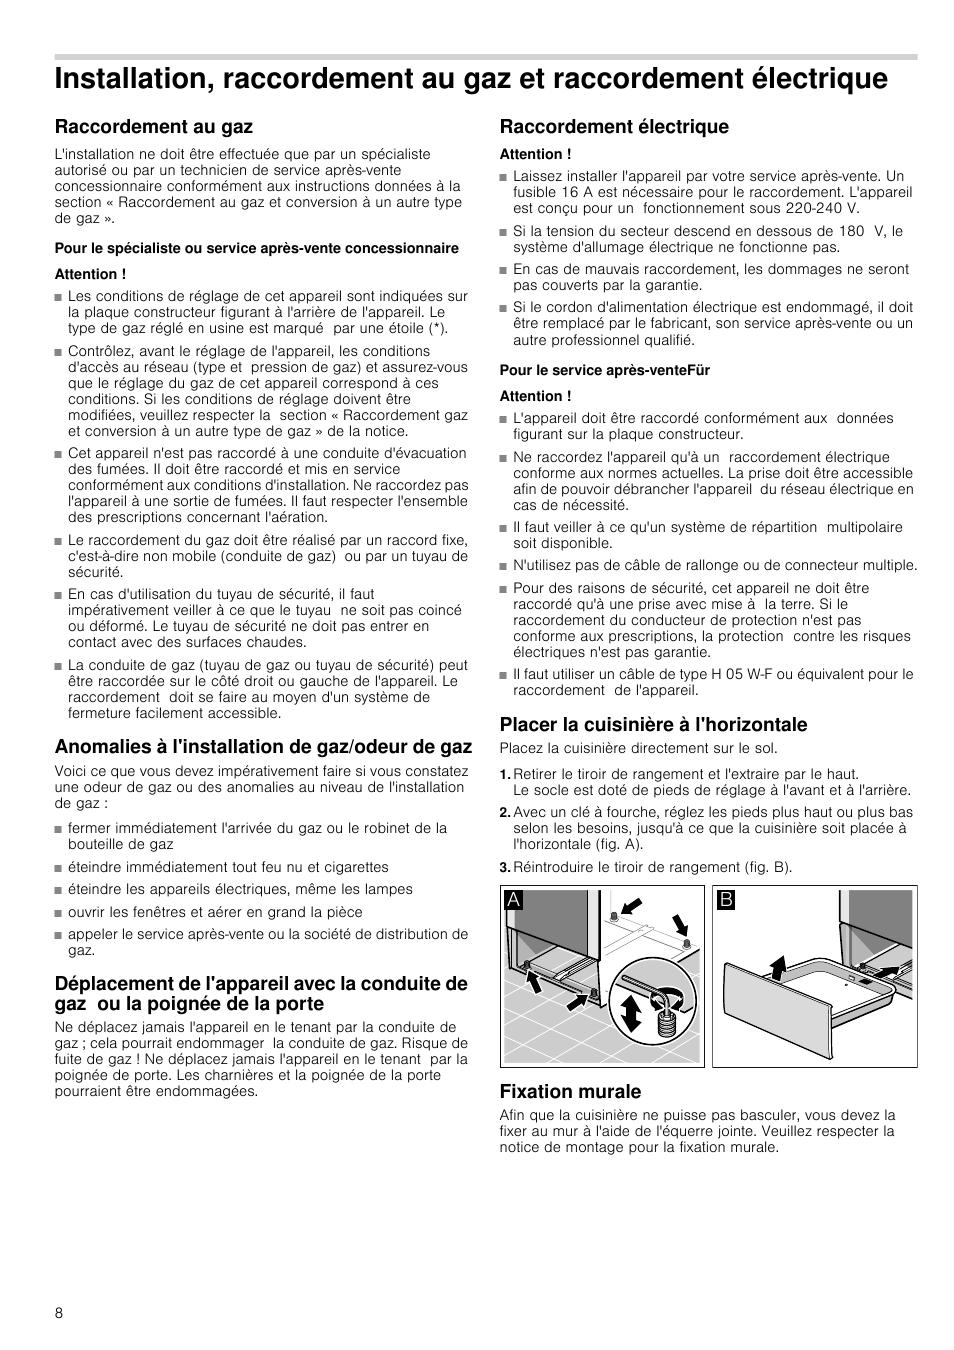 raccordement au gaz attention anomalies l 39 installation de gaz odeur de gaz siemens. Black Bedroom Furniture Sets. Home Design Ideas